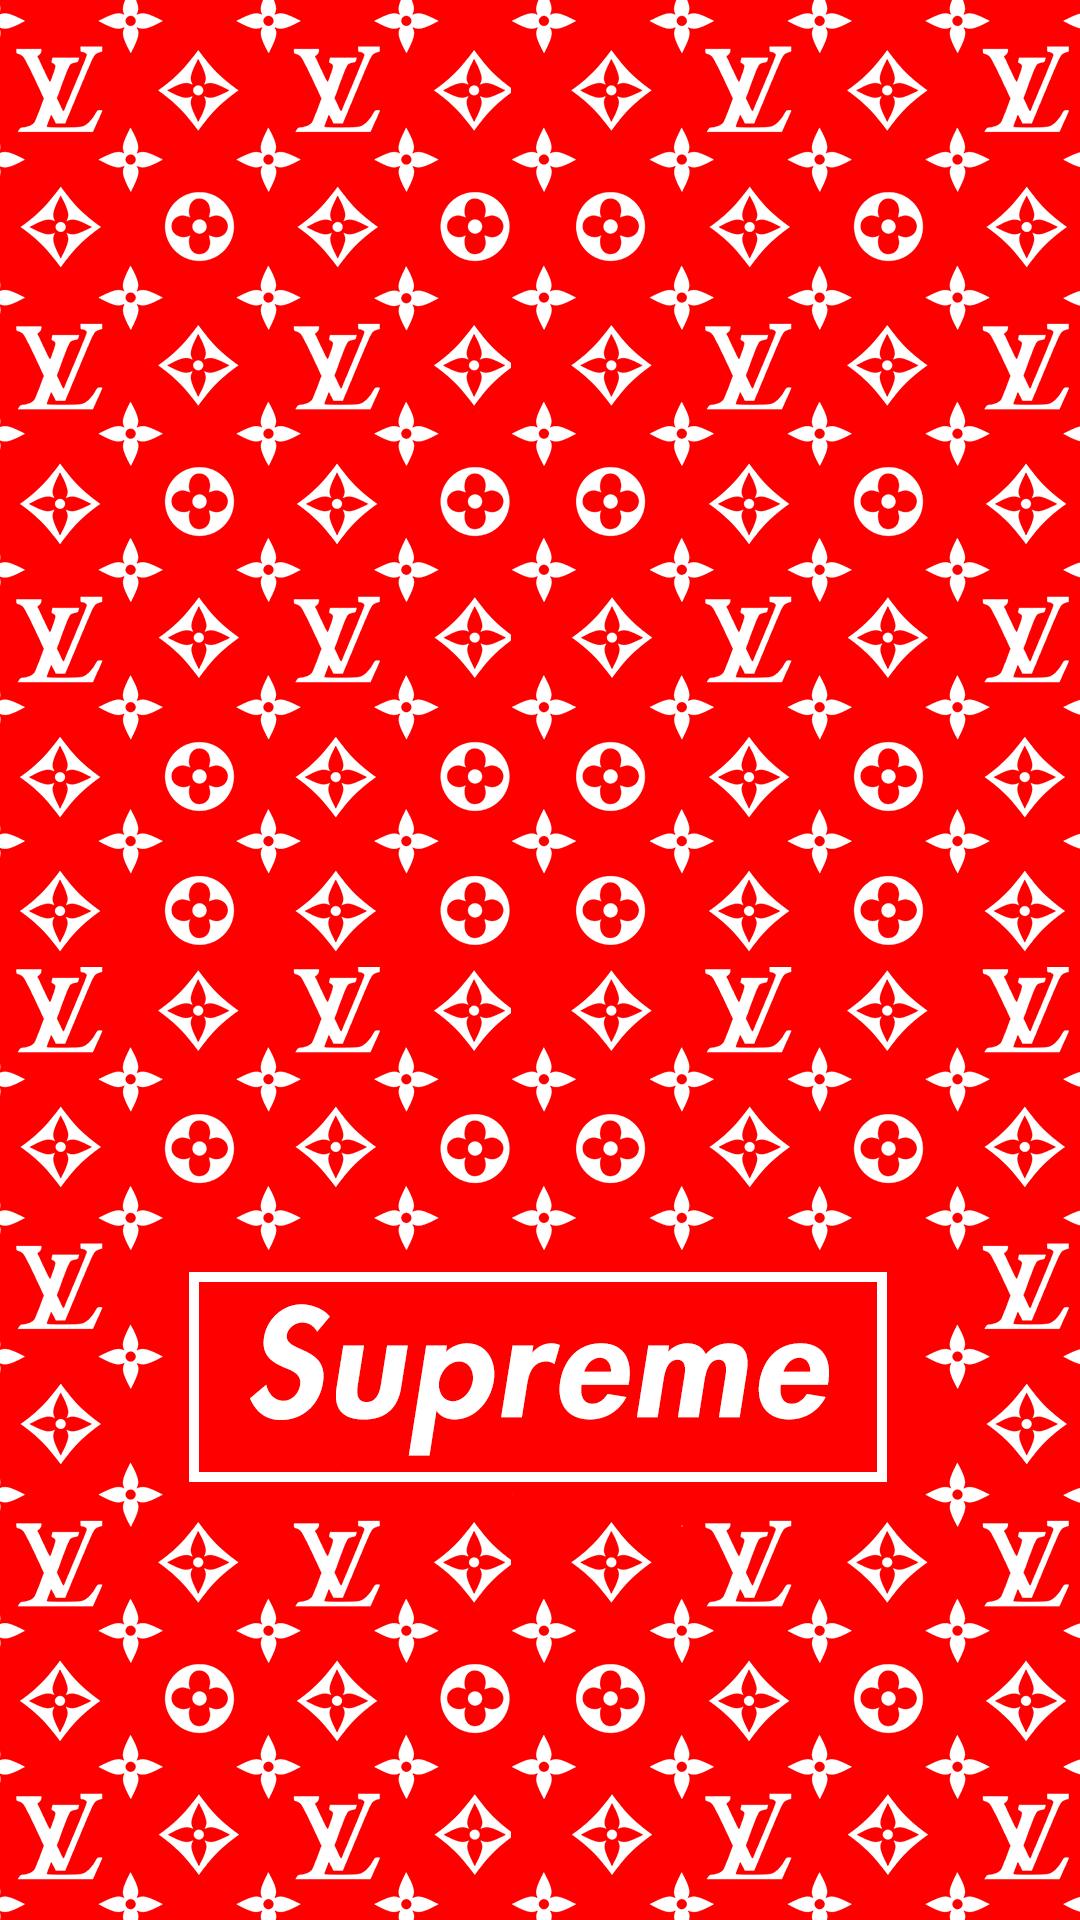 70 Supreme Wallpapers In 4k Allhdwallpapers Supreme Wallpaper Supreme Iphone Wallpaper Louis Vuitton Iphone Wallpaper